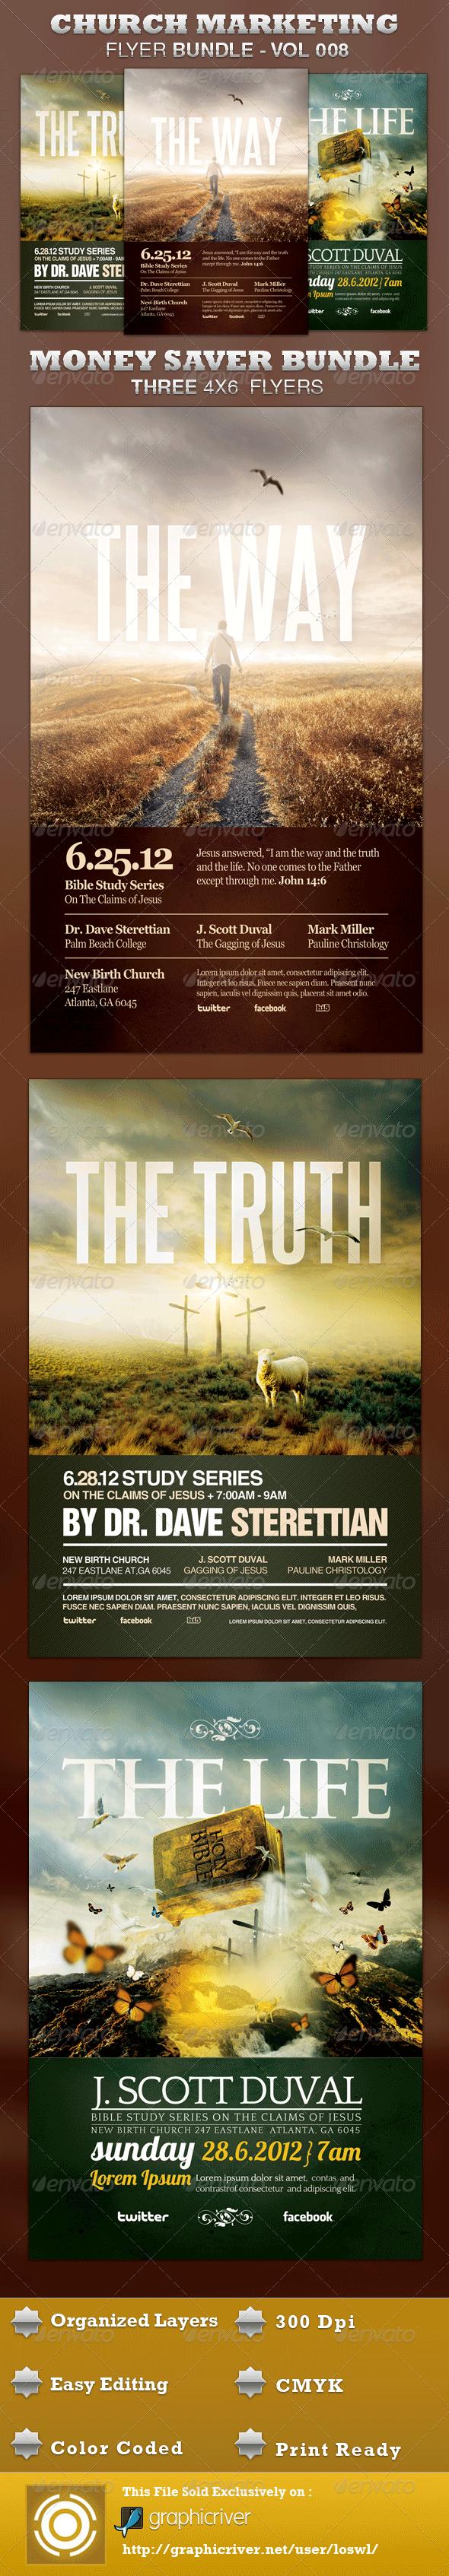 GraphicRiver Church Marketing Flyer Bundle-Vol 008 3442086